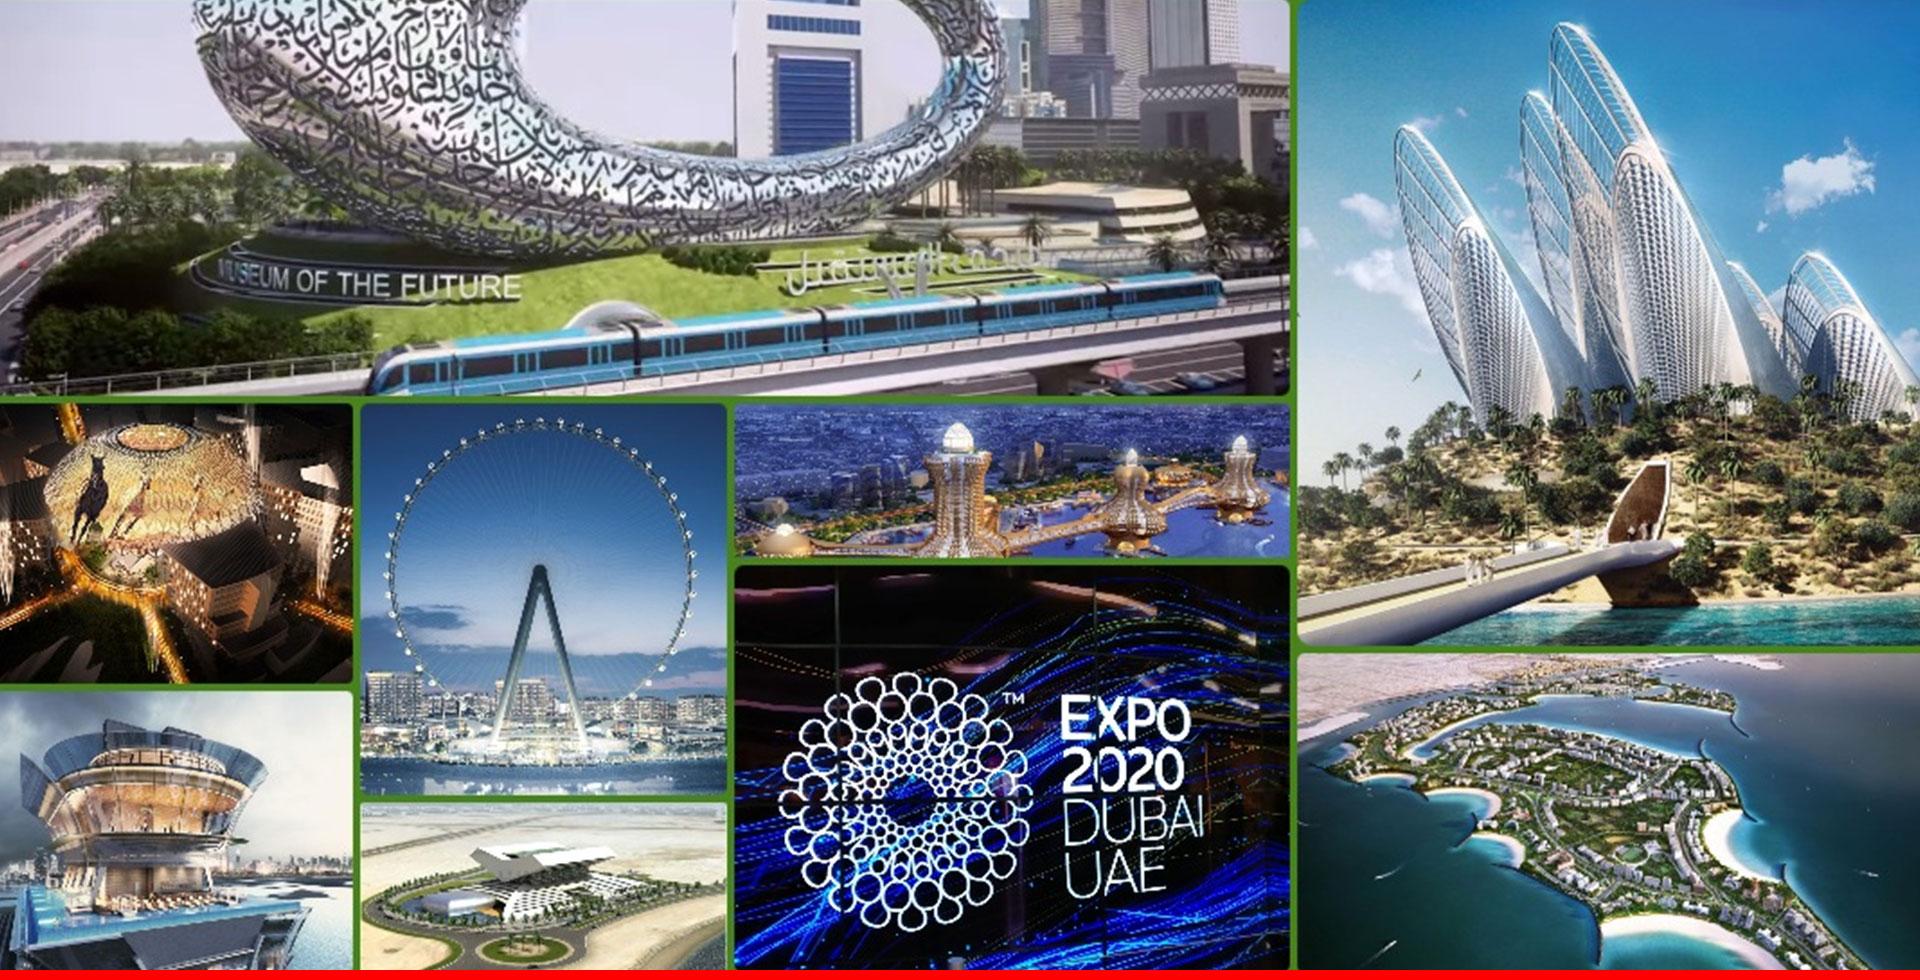 Top Tourist Attractions in Dubai for UAE Trip in 2019